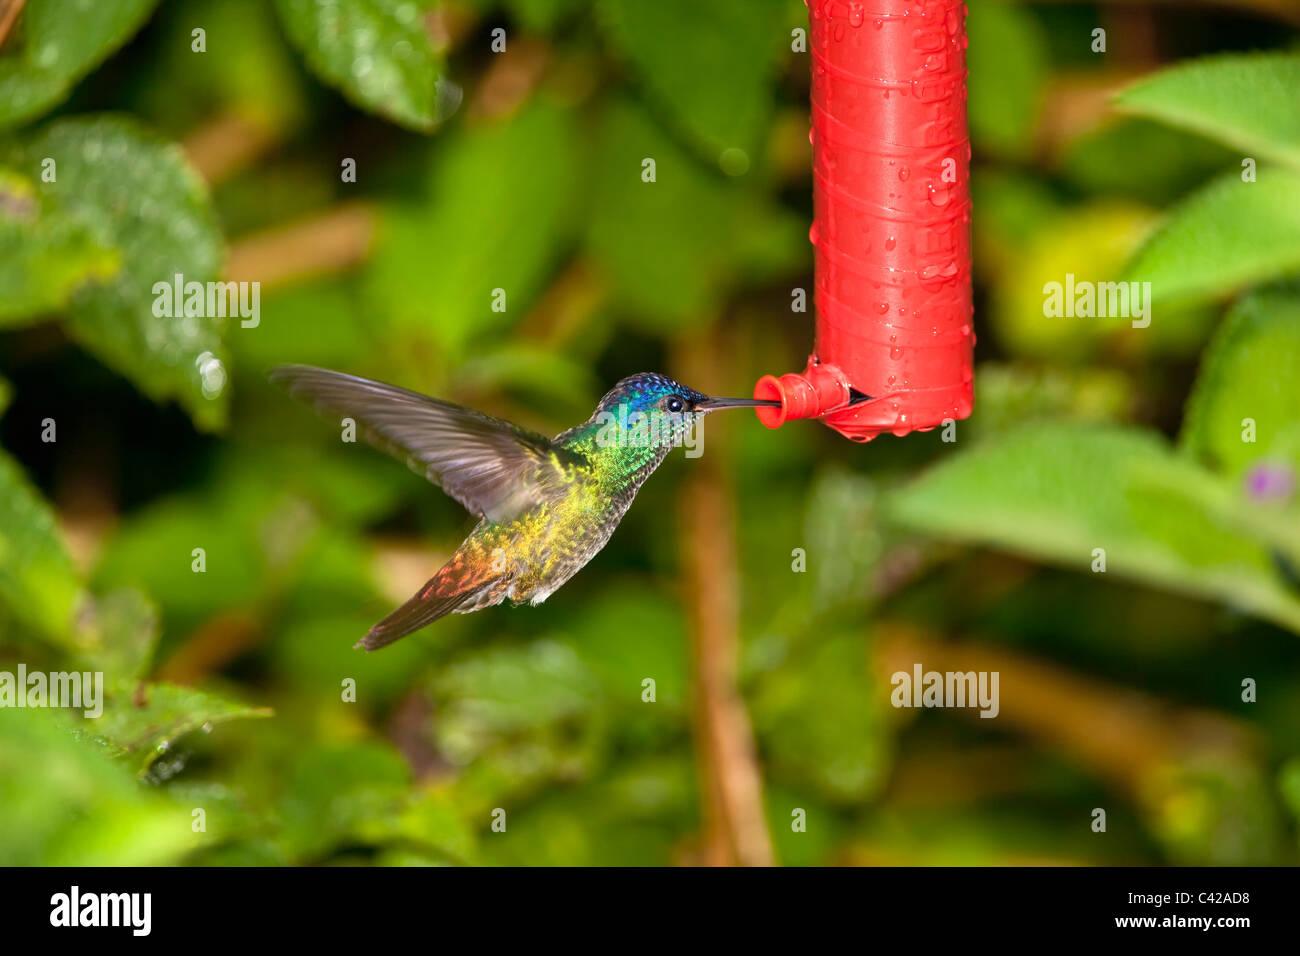 Manu National Park, Pantiacolla mountains. Golden Tailed Sapphire Hummingbird ( Chrysuronia Oenone ). Male. At feeder. - Stock Image